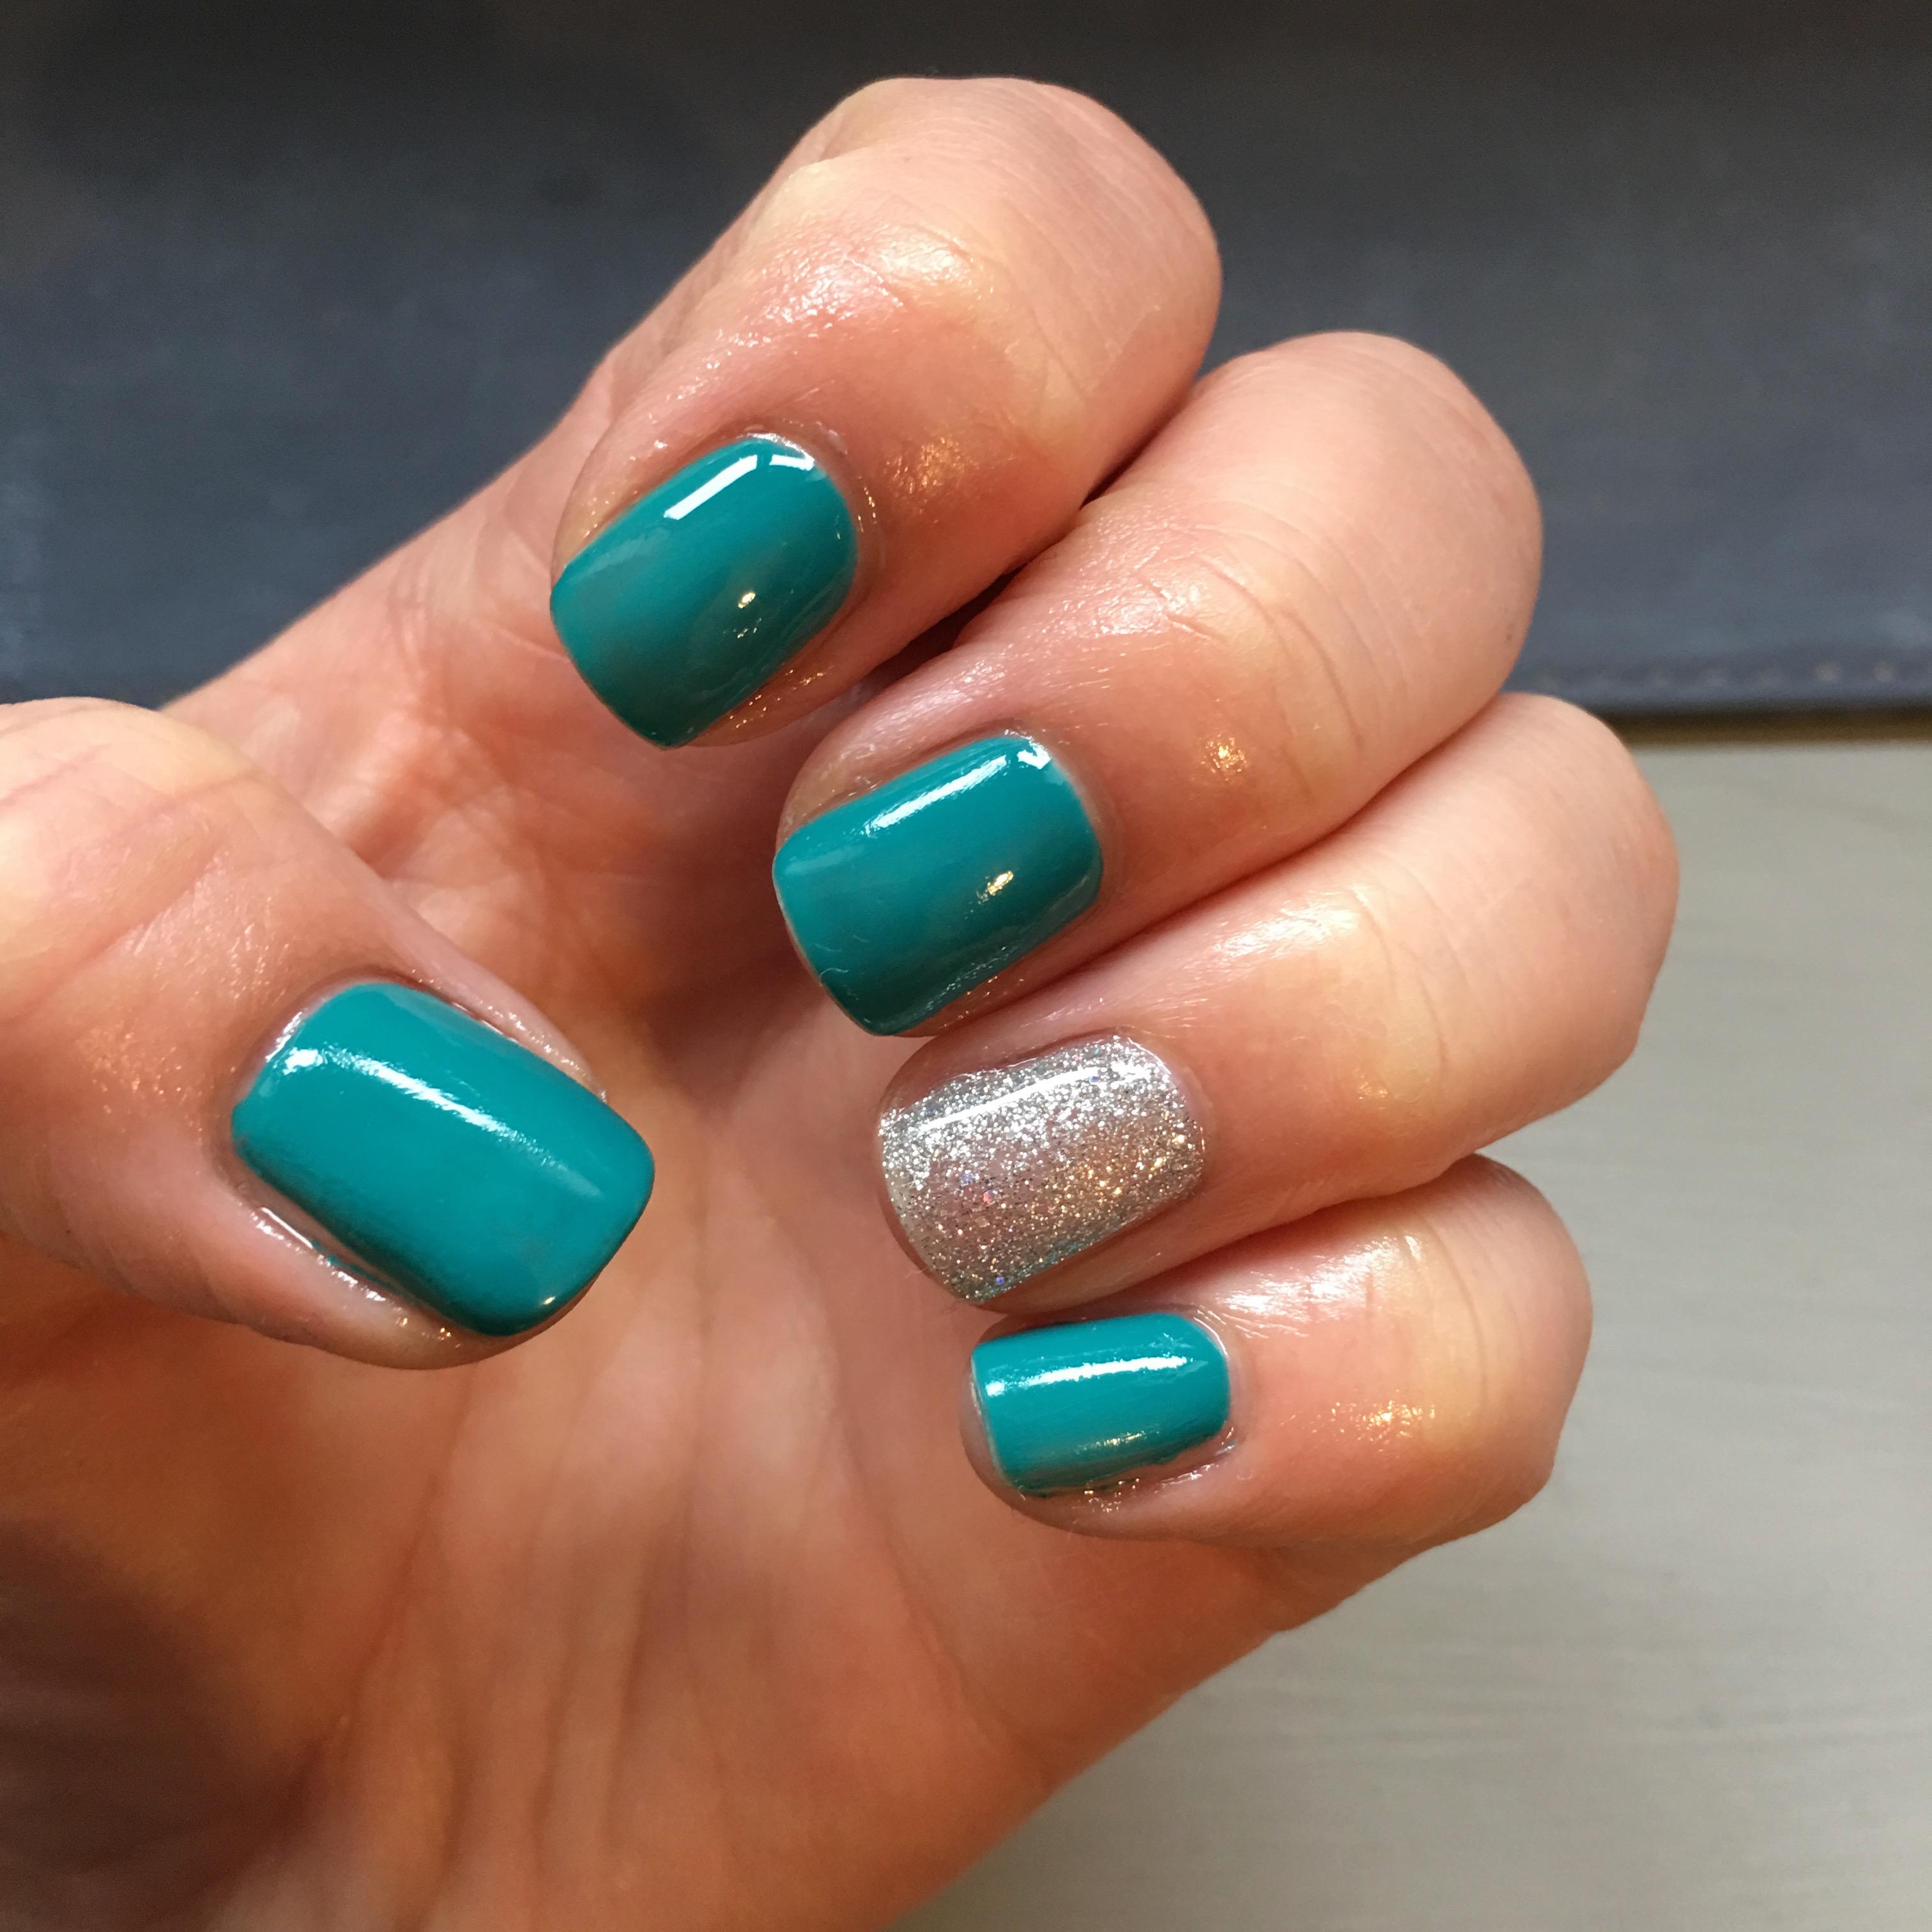 gel nails at home amazon photo - 2